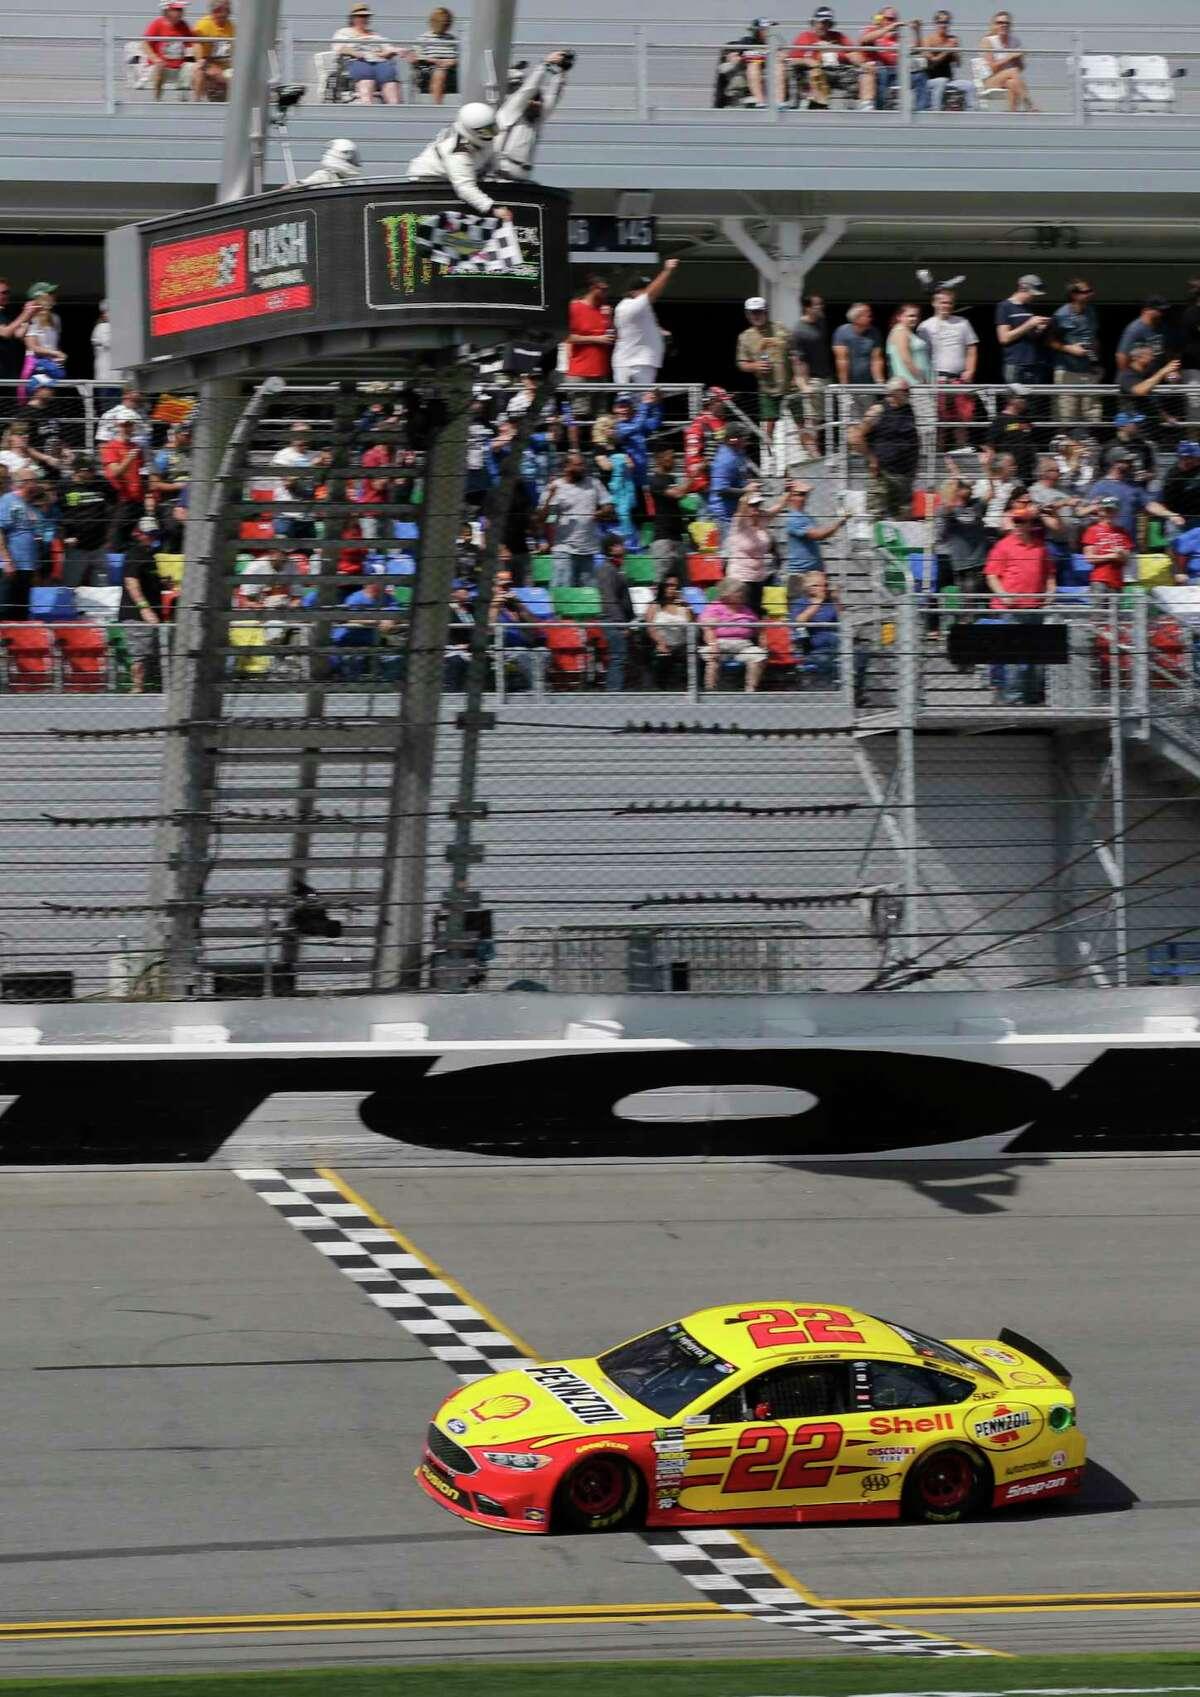 Joey Logano takes the checkered flag as he crosses the finish line to win the NASCAR Clash auto race at Daytona International Speedway, Sunday, Feb. 19, 2017, in Daytona Beach, Fla. (AP Photo/Terry Renna) ORG XMIT: DBR113